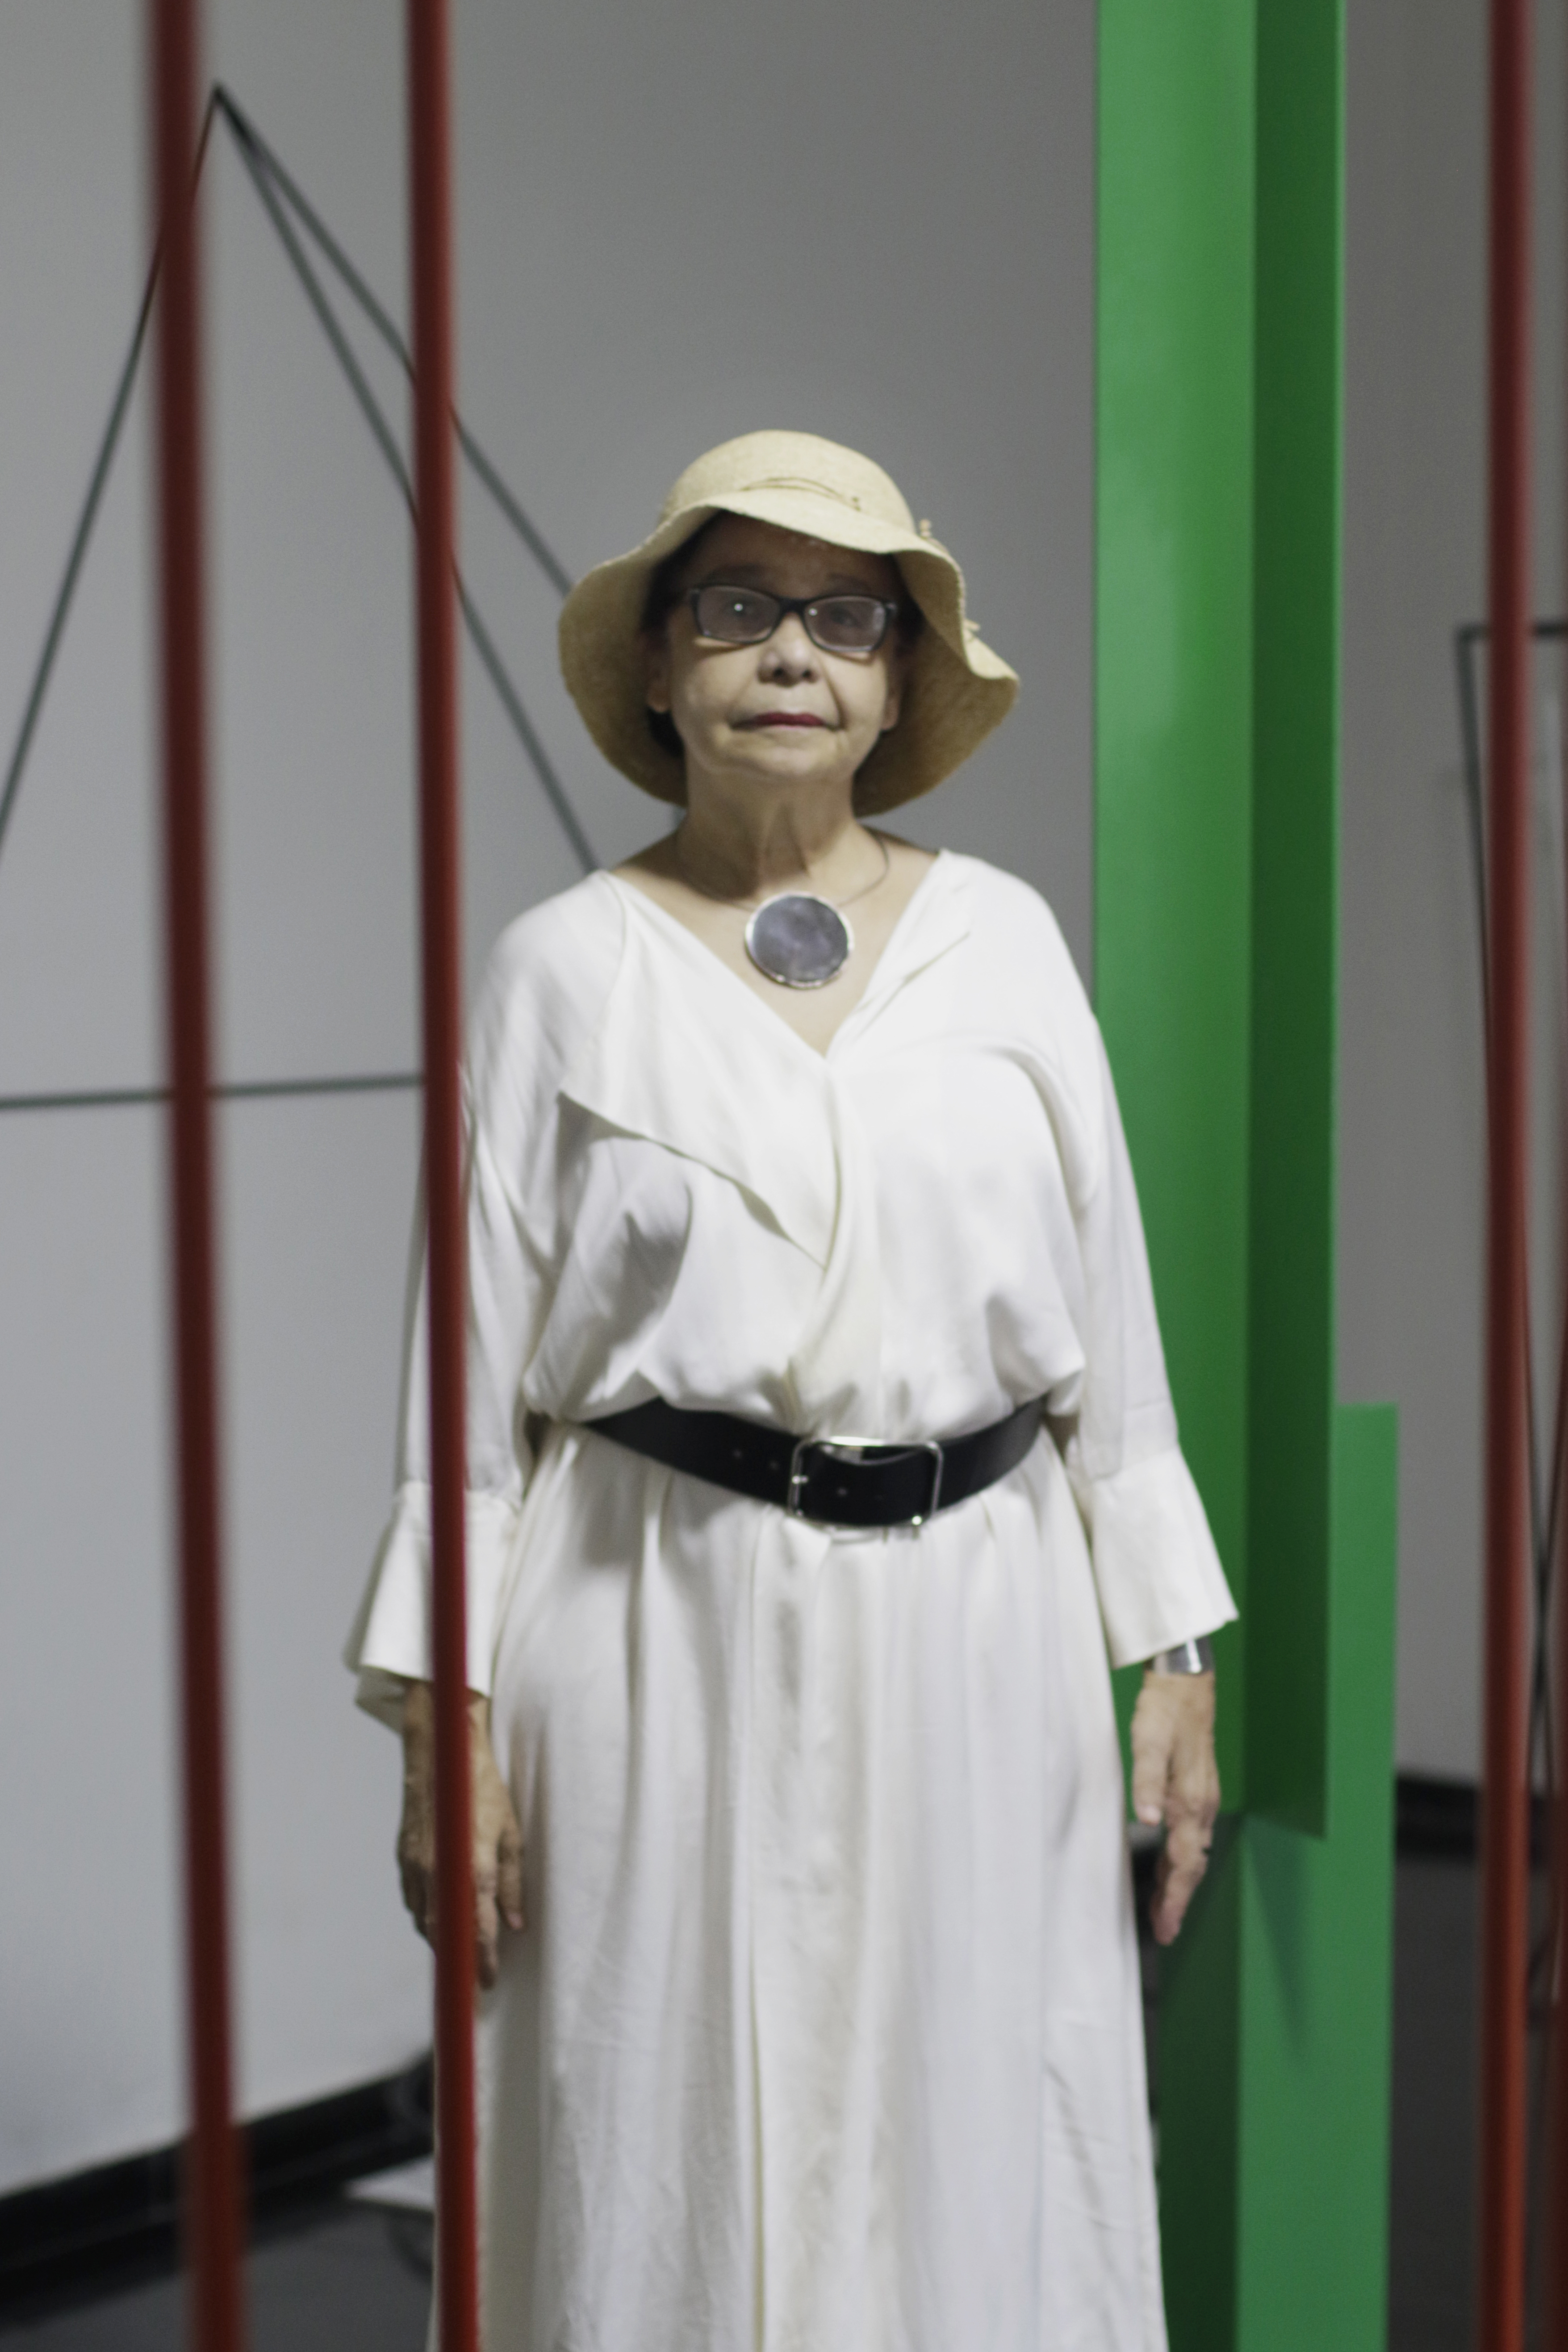 FORTALEZA, CE, BRASIL, 20.02.2021: Curadora e Artista Visual, Dodora Guimaraes (Foto: Thais Mesquita/O POVO)